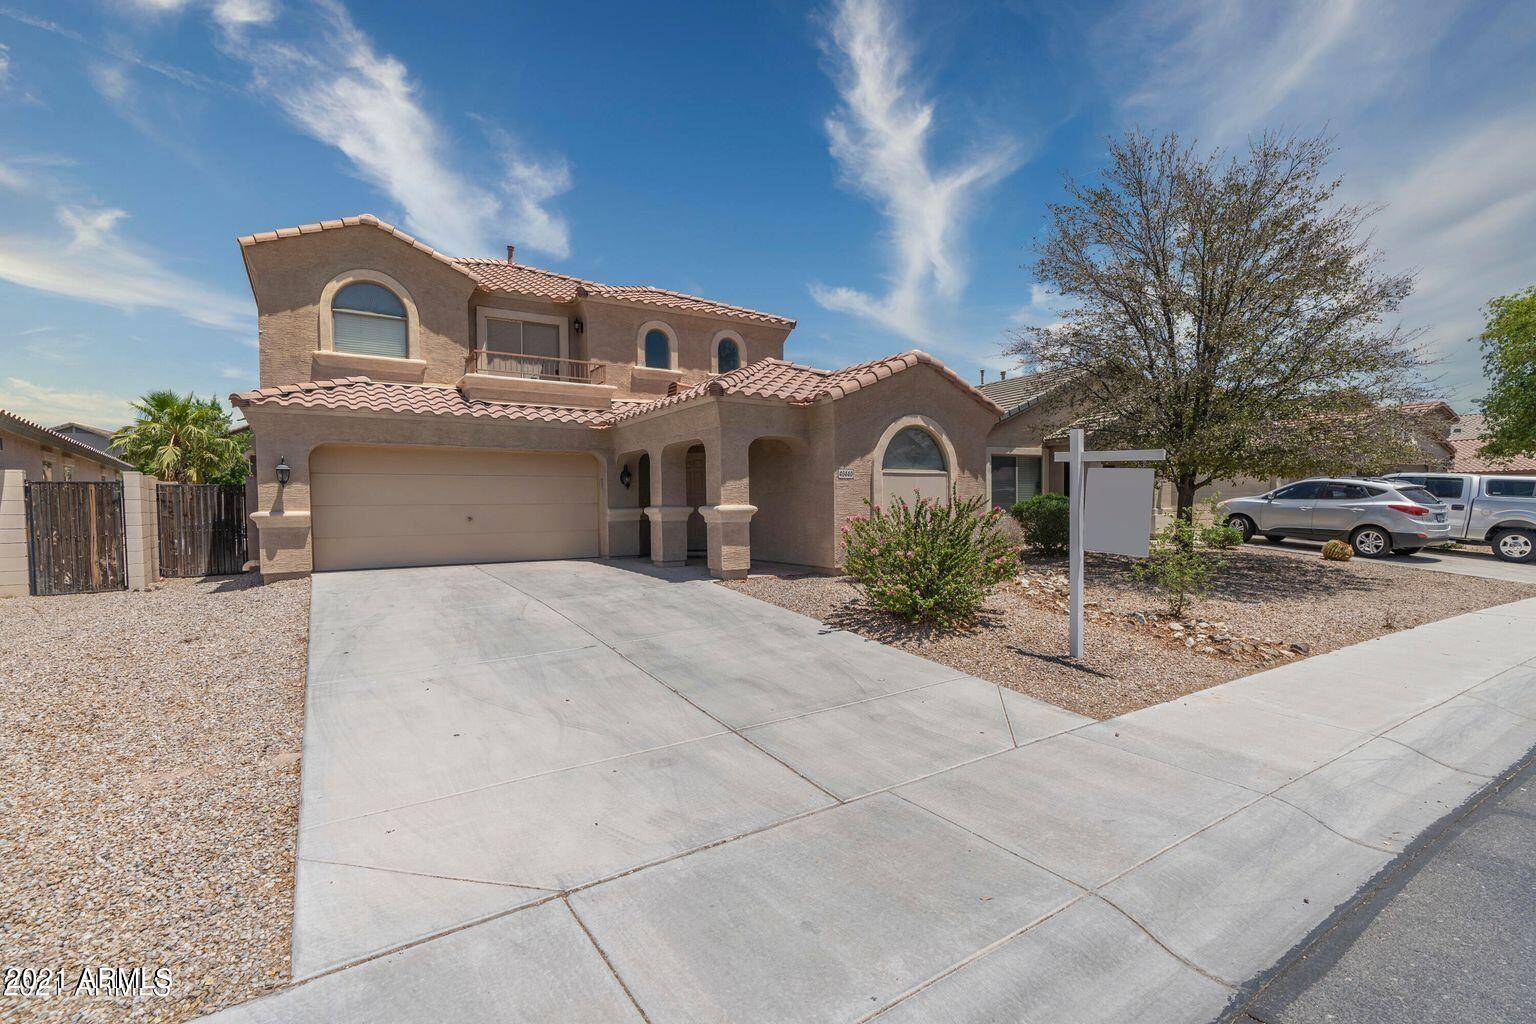 Photo for 40440 W ROBBINS Drive, Maricopa, AZ 85138 (MLS # 6283612)